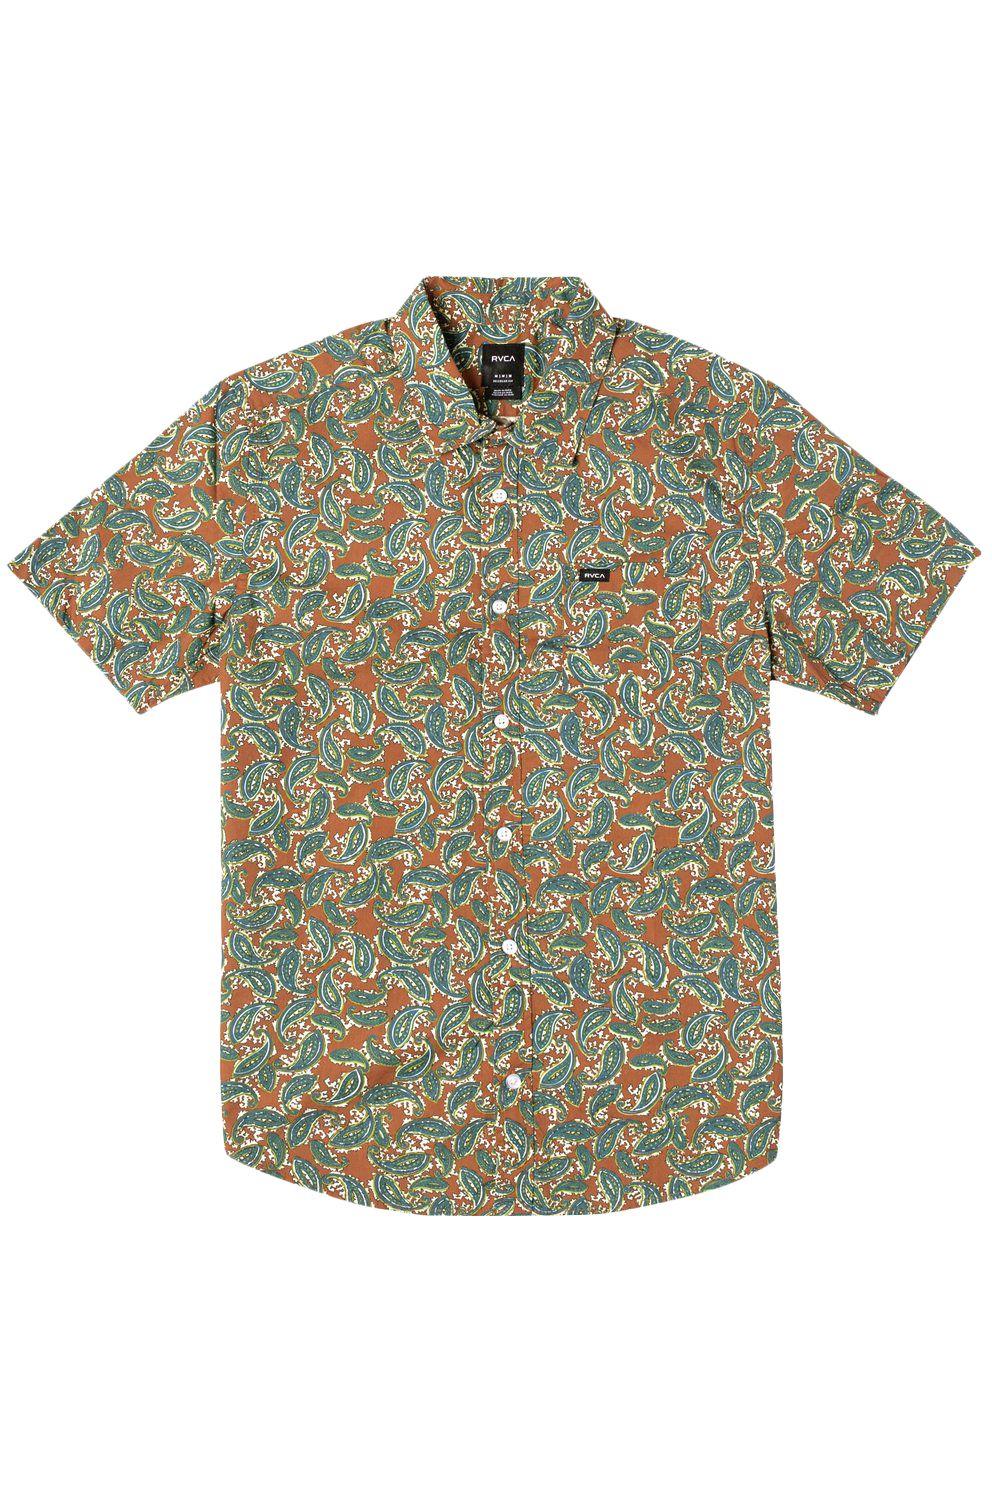 RVCA Shirt MIND FLOWER PAISLEY Clay